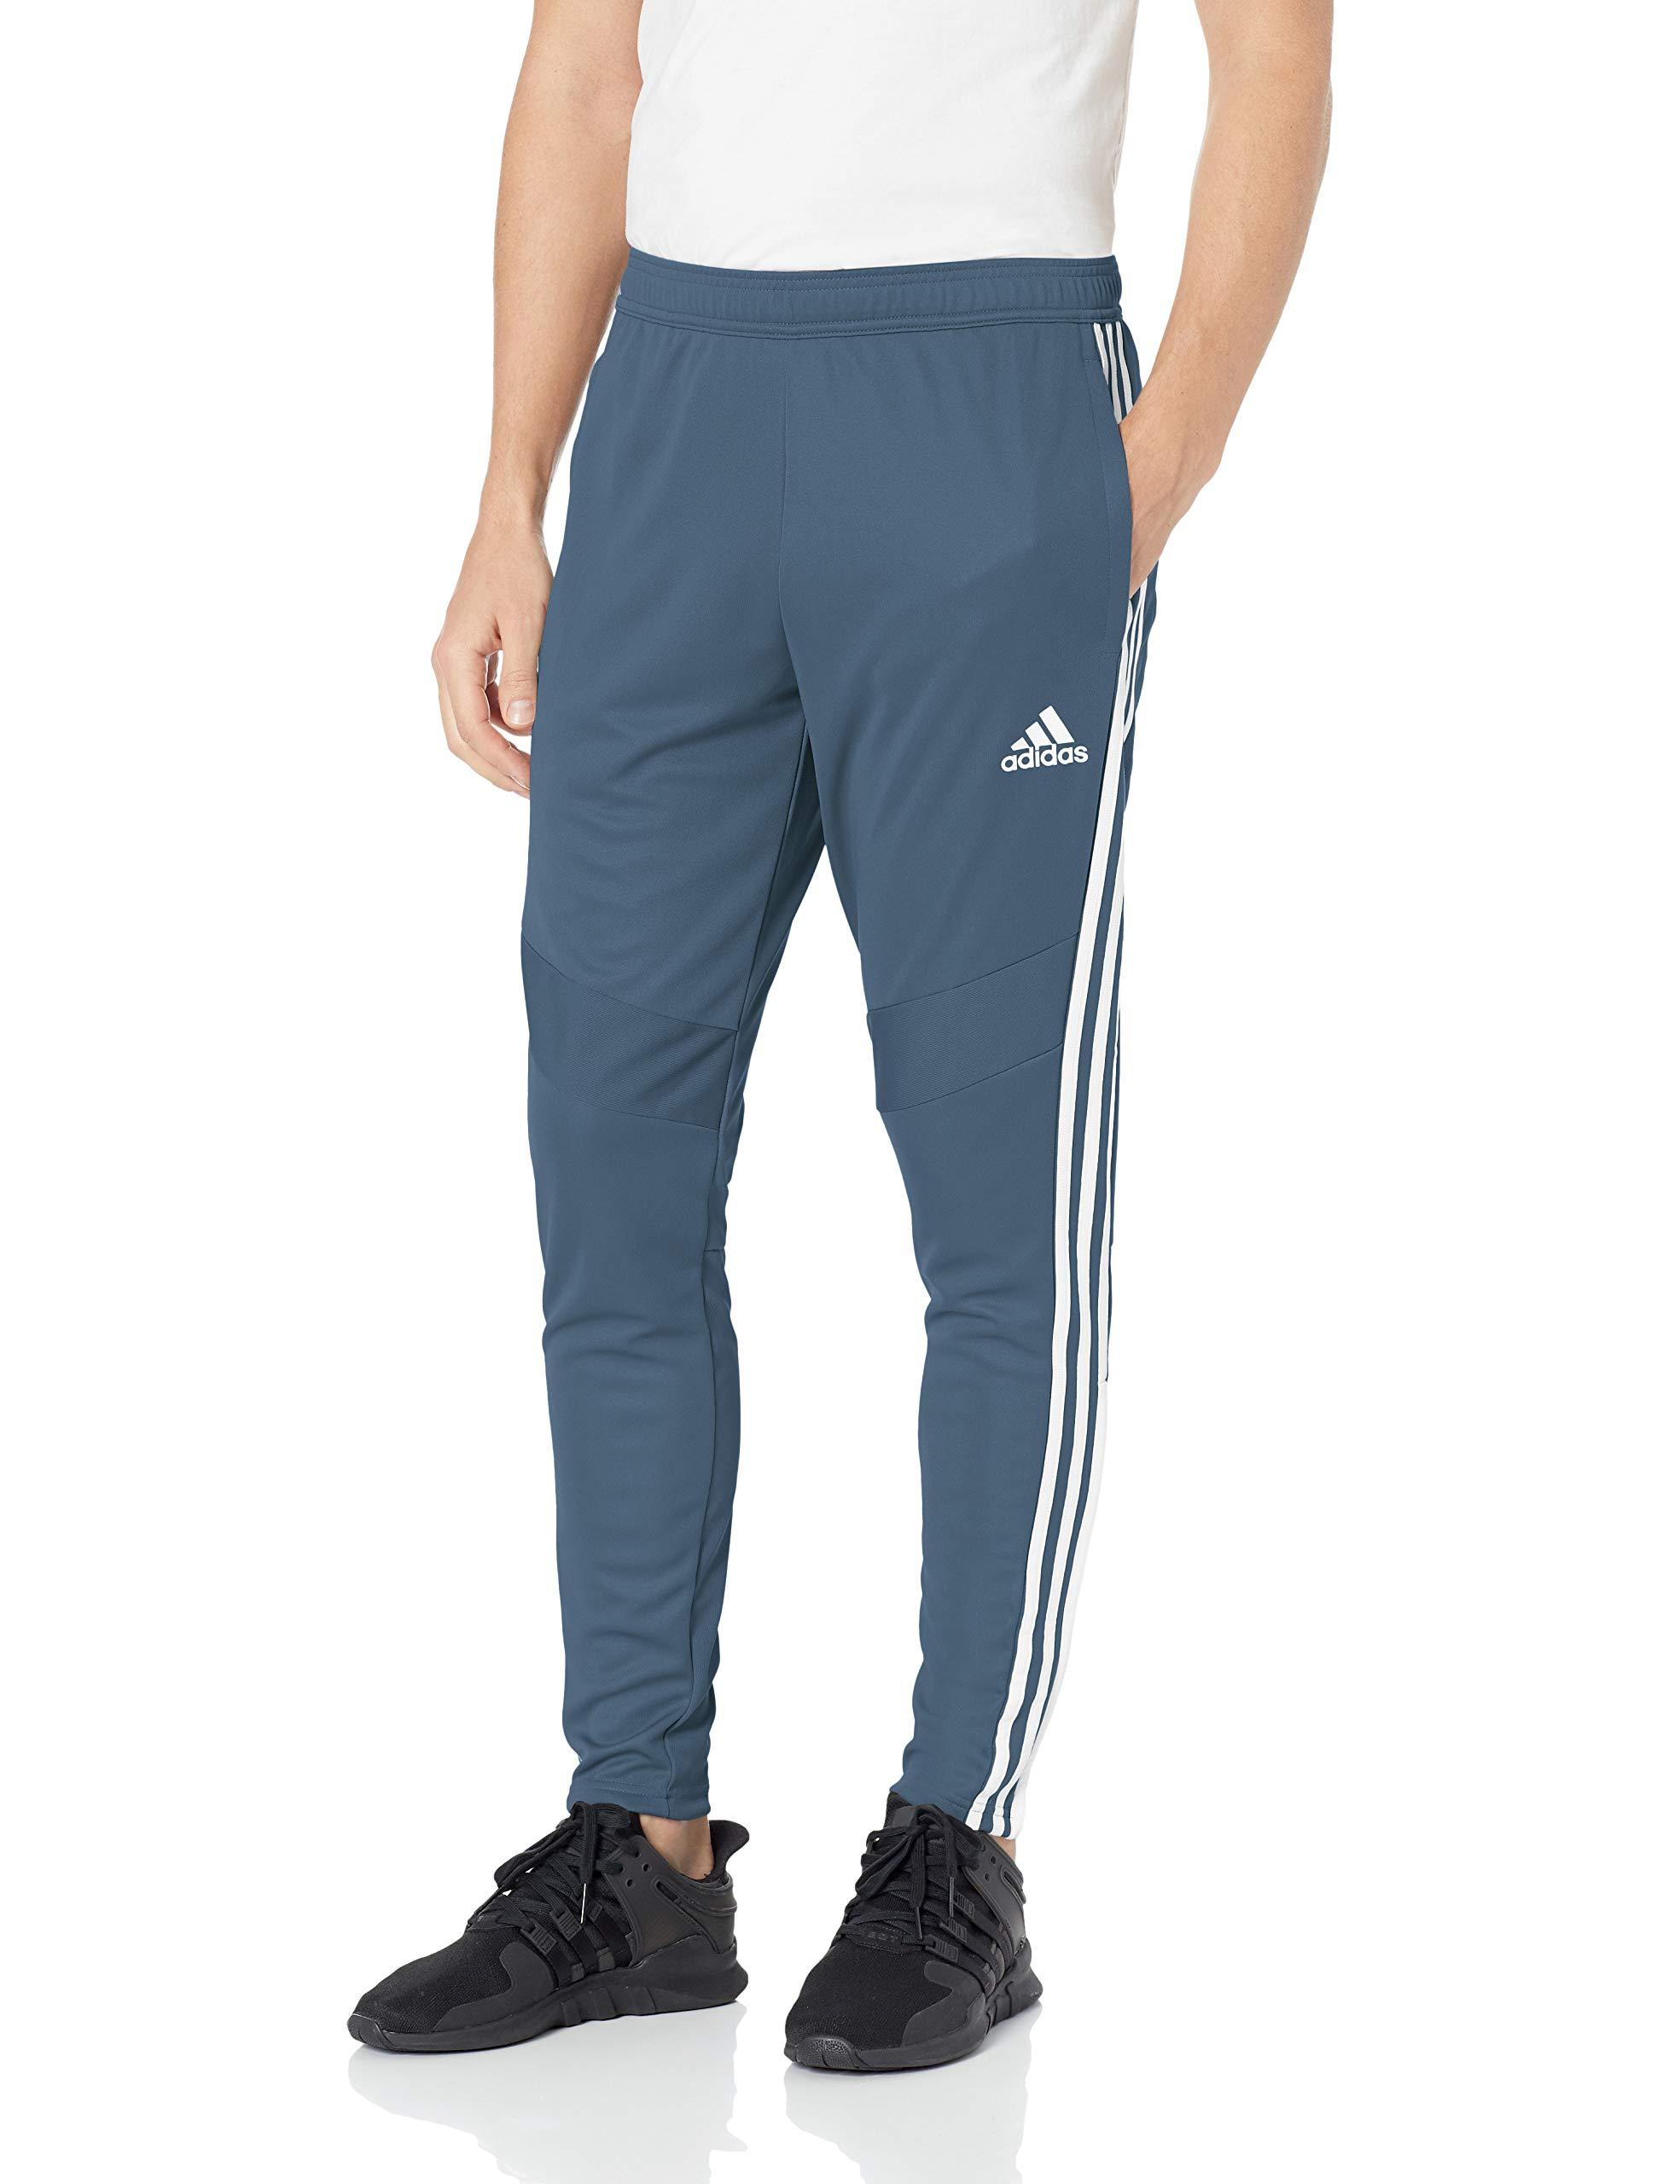 adidas Men's Tiro 19 Pants, Open Blue, X-Small